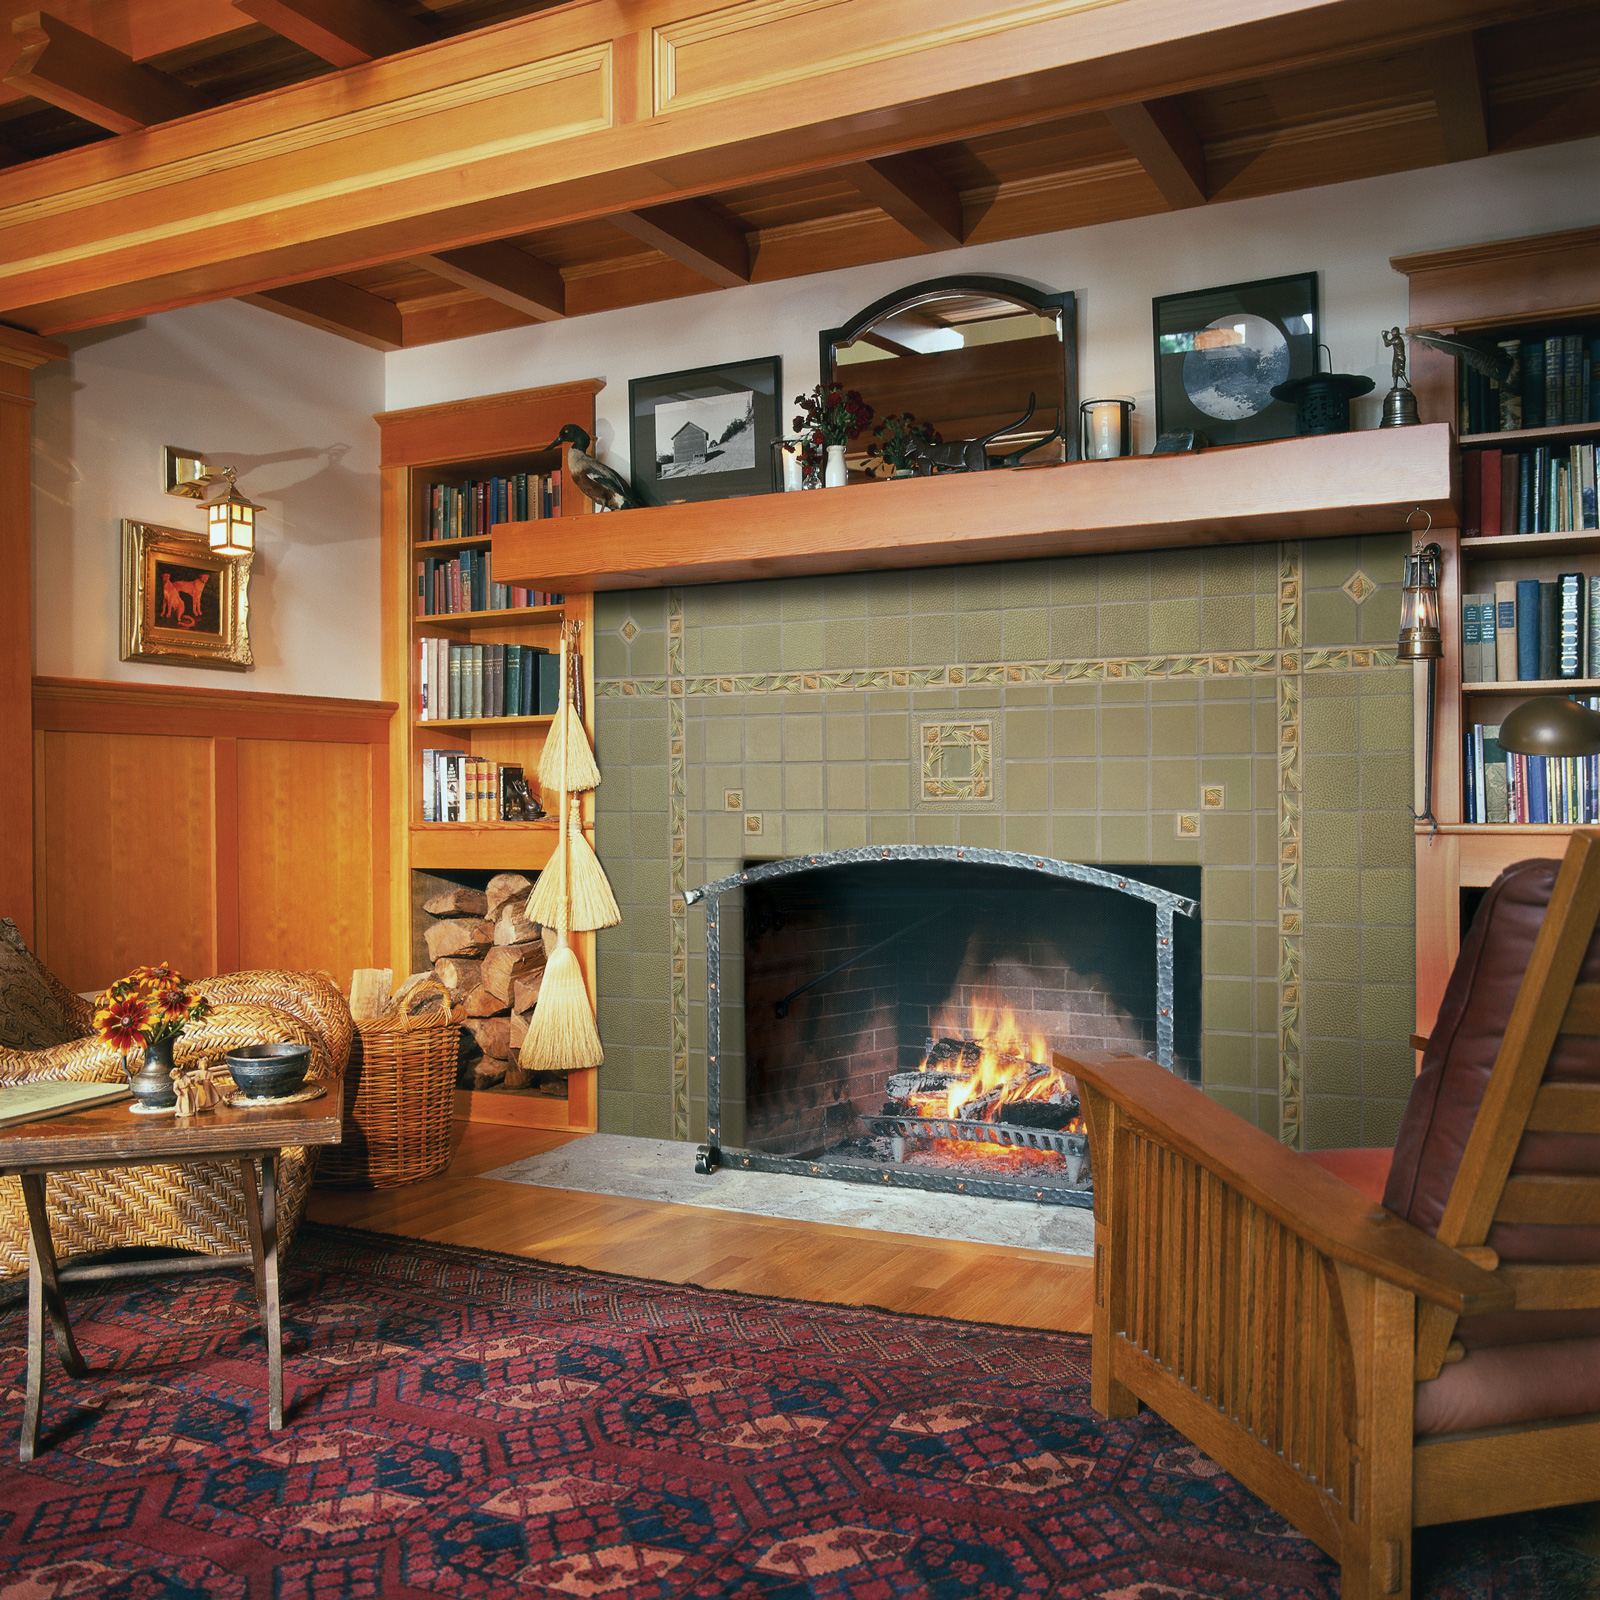 shearrow-tile-pinecone-fireplace.jpg